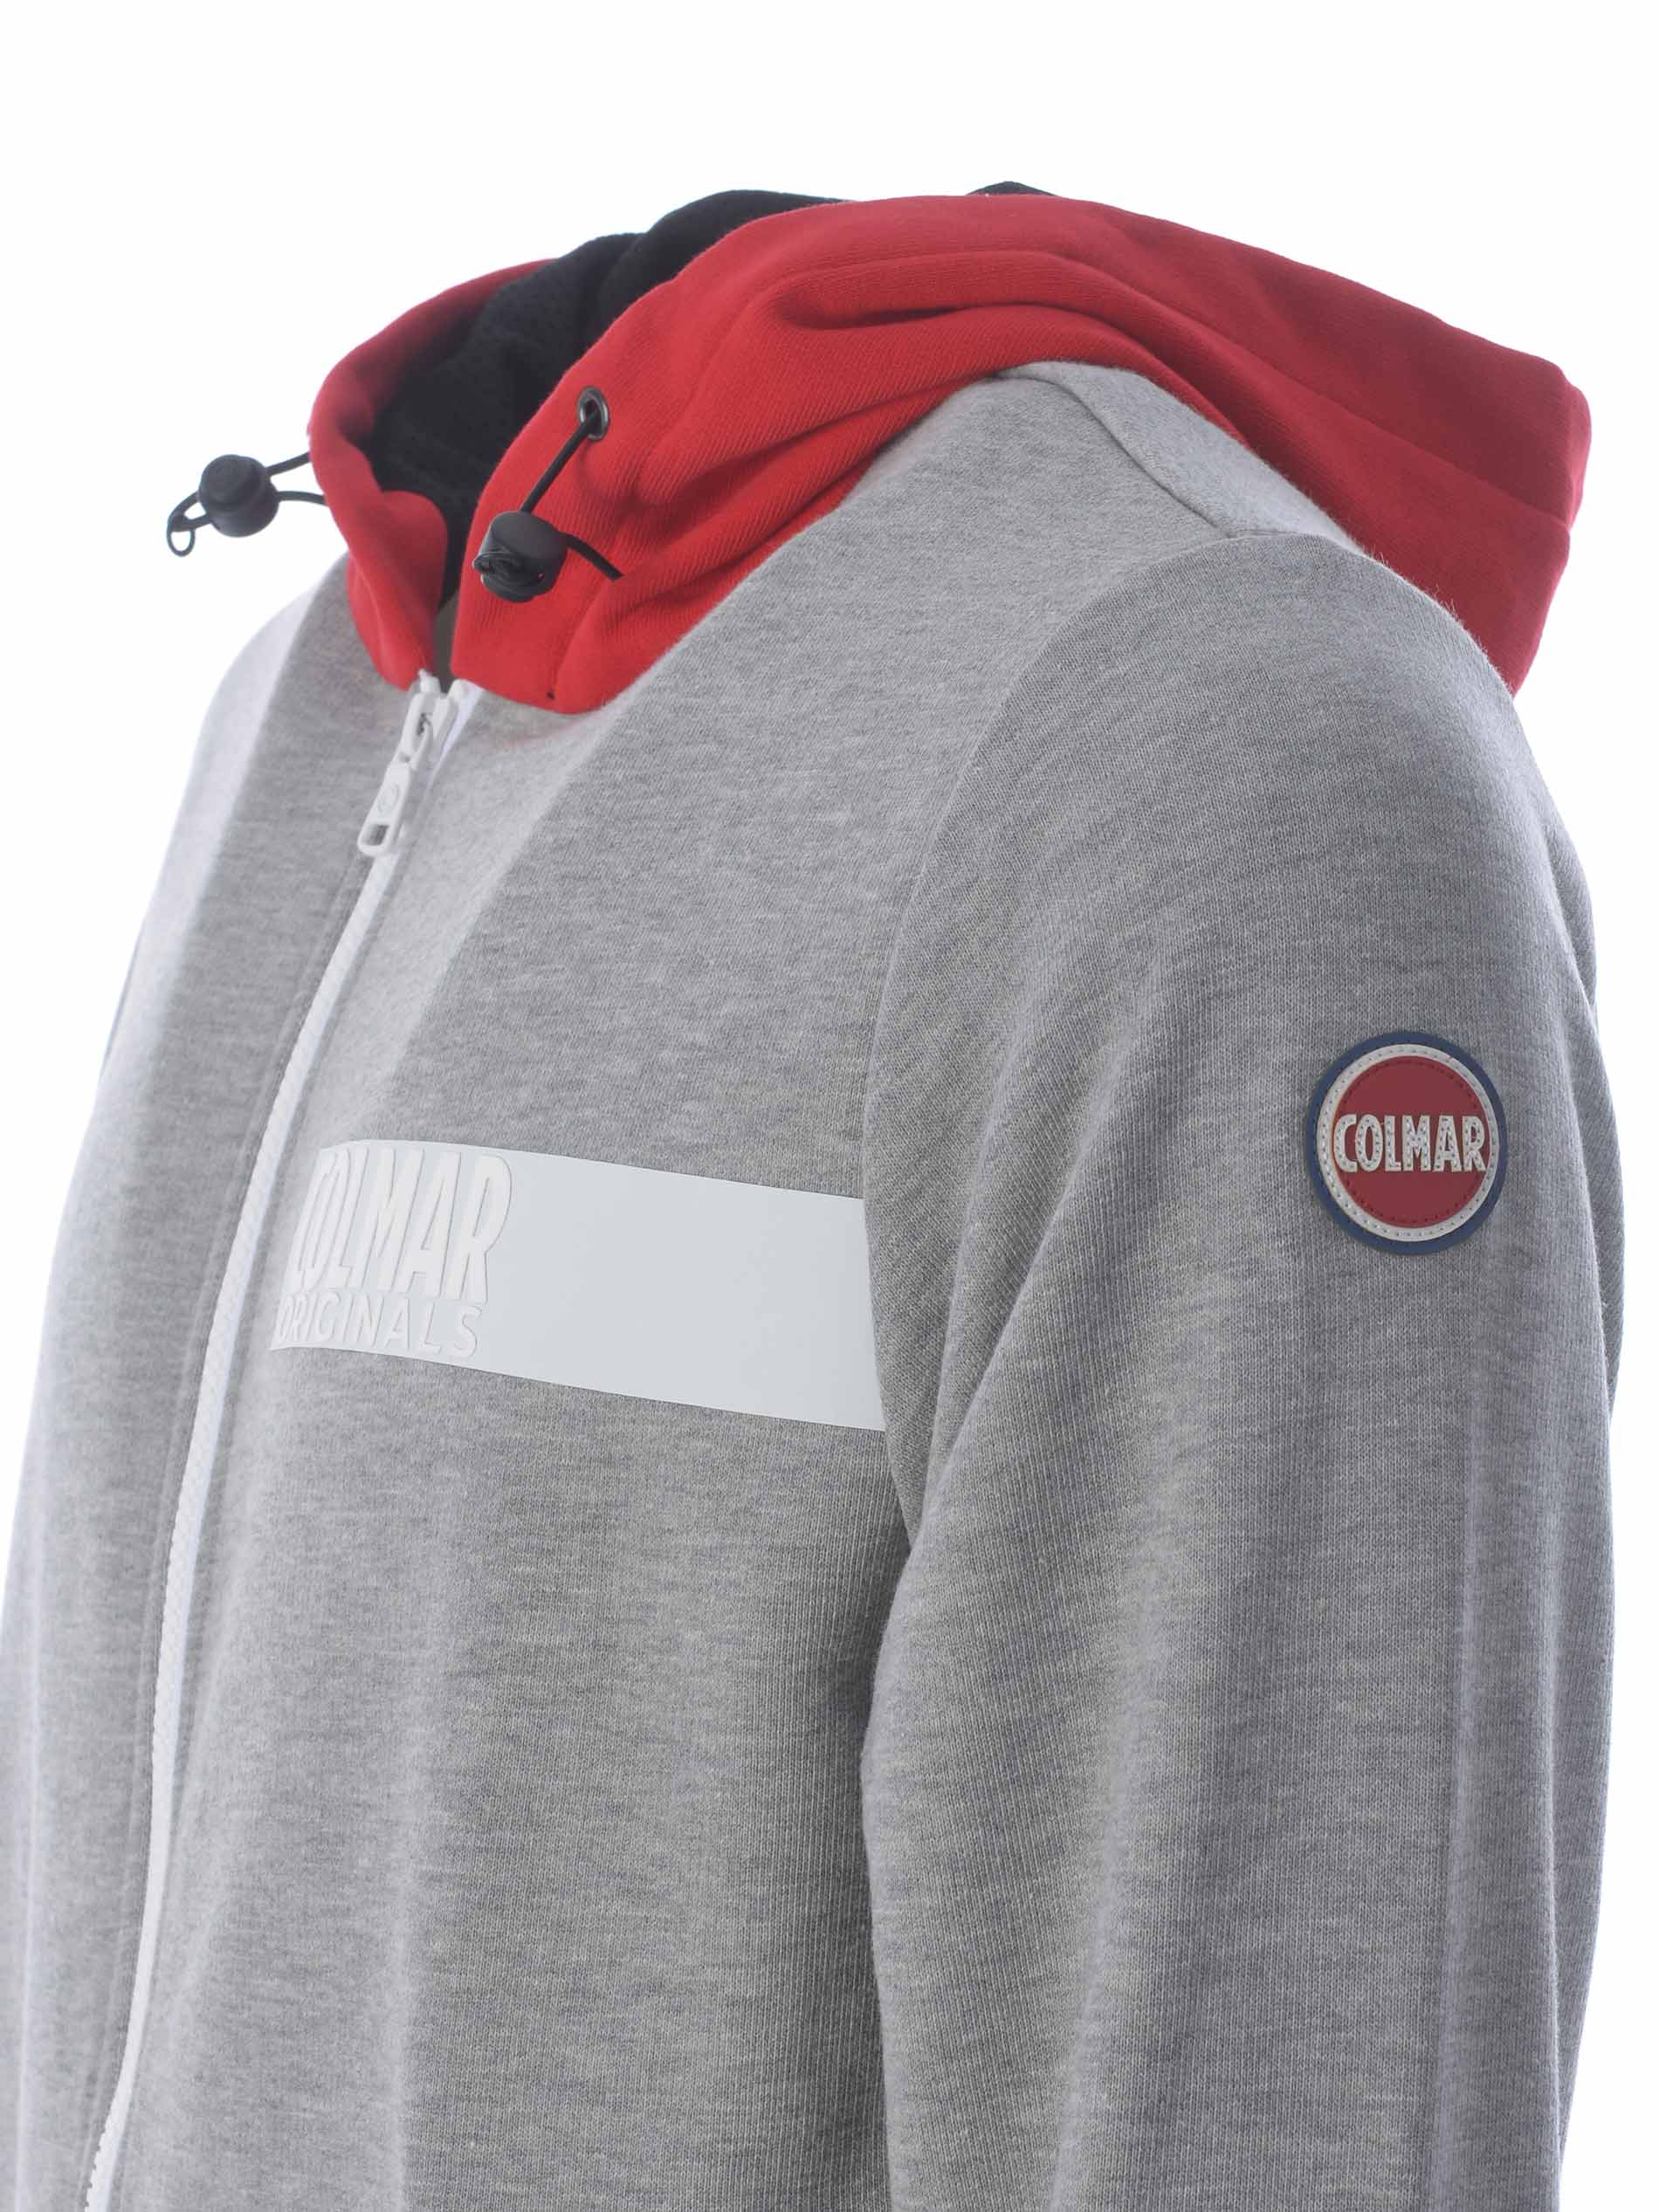 Colmar originals sweatshirt in cotton blend COLMAR ORIGINALS   10000005   82385TK-21